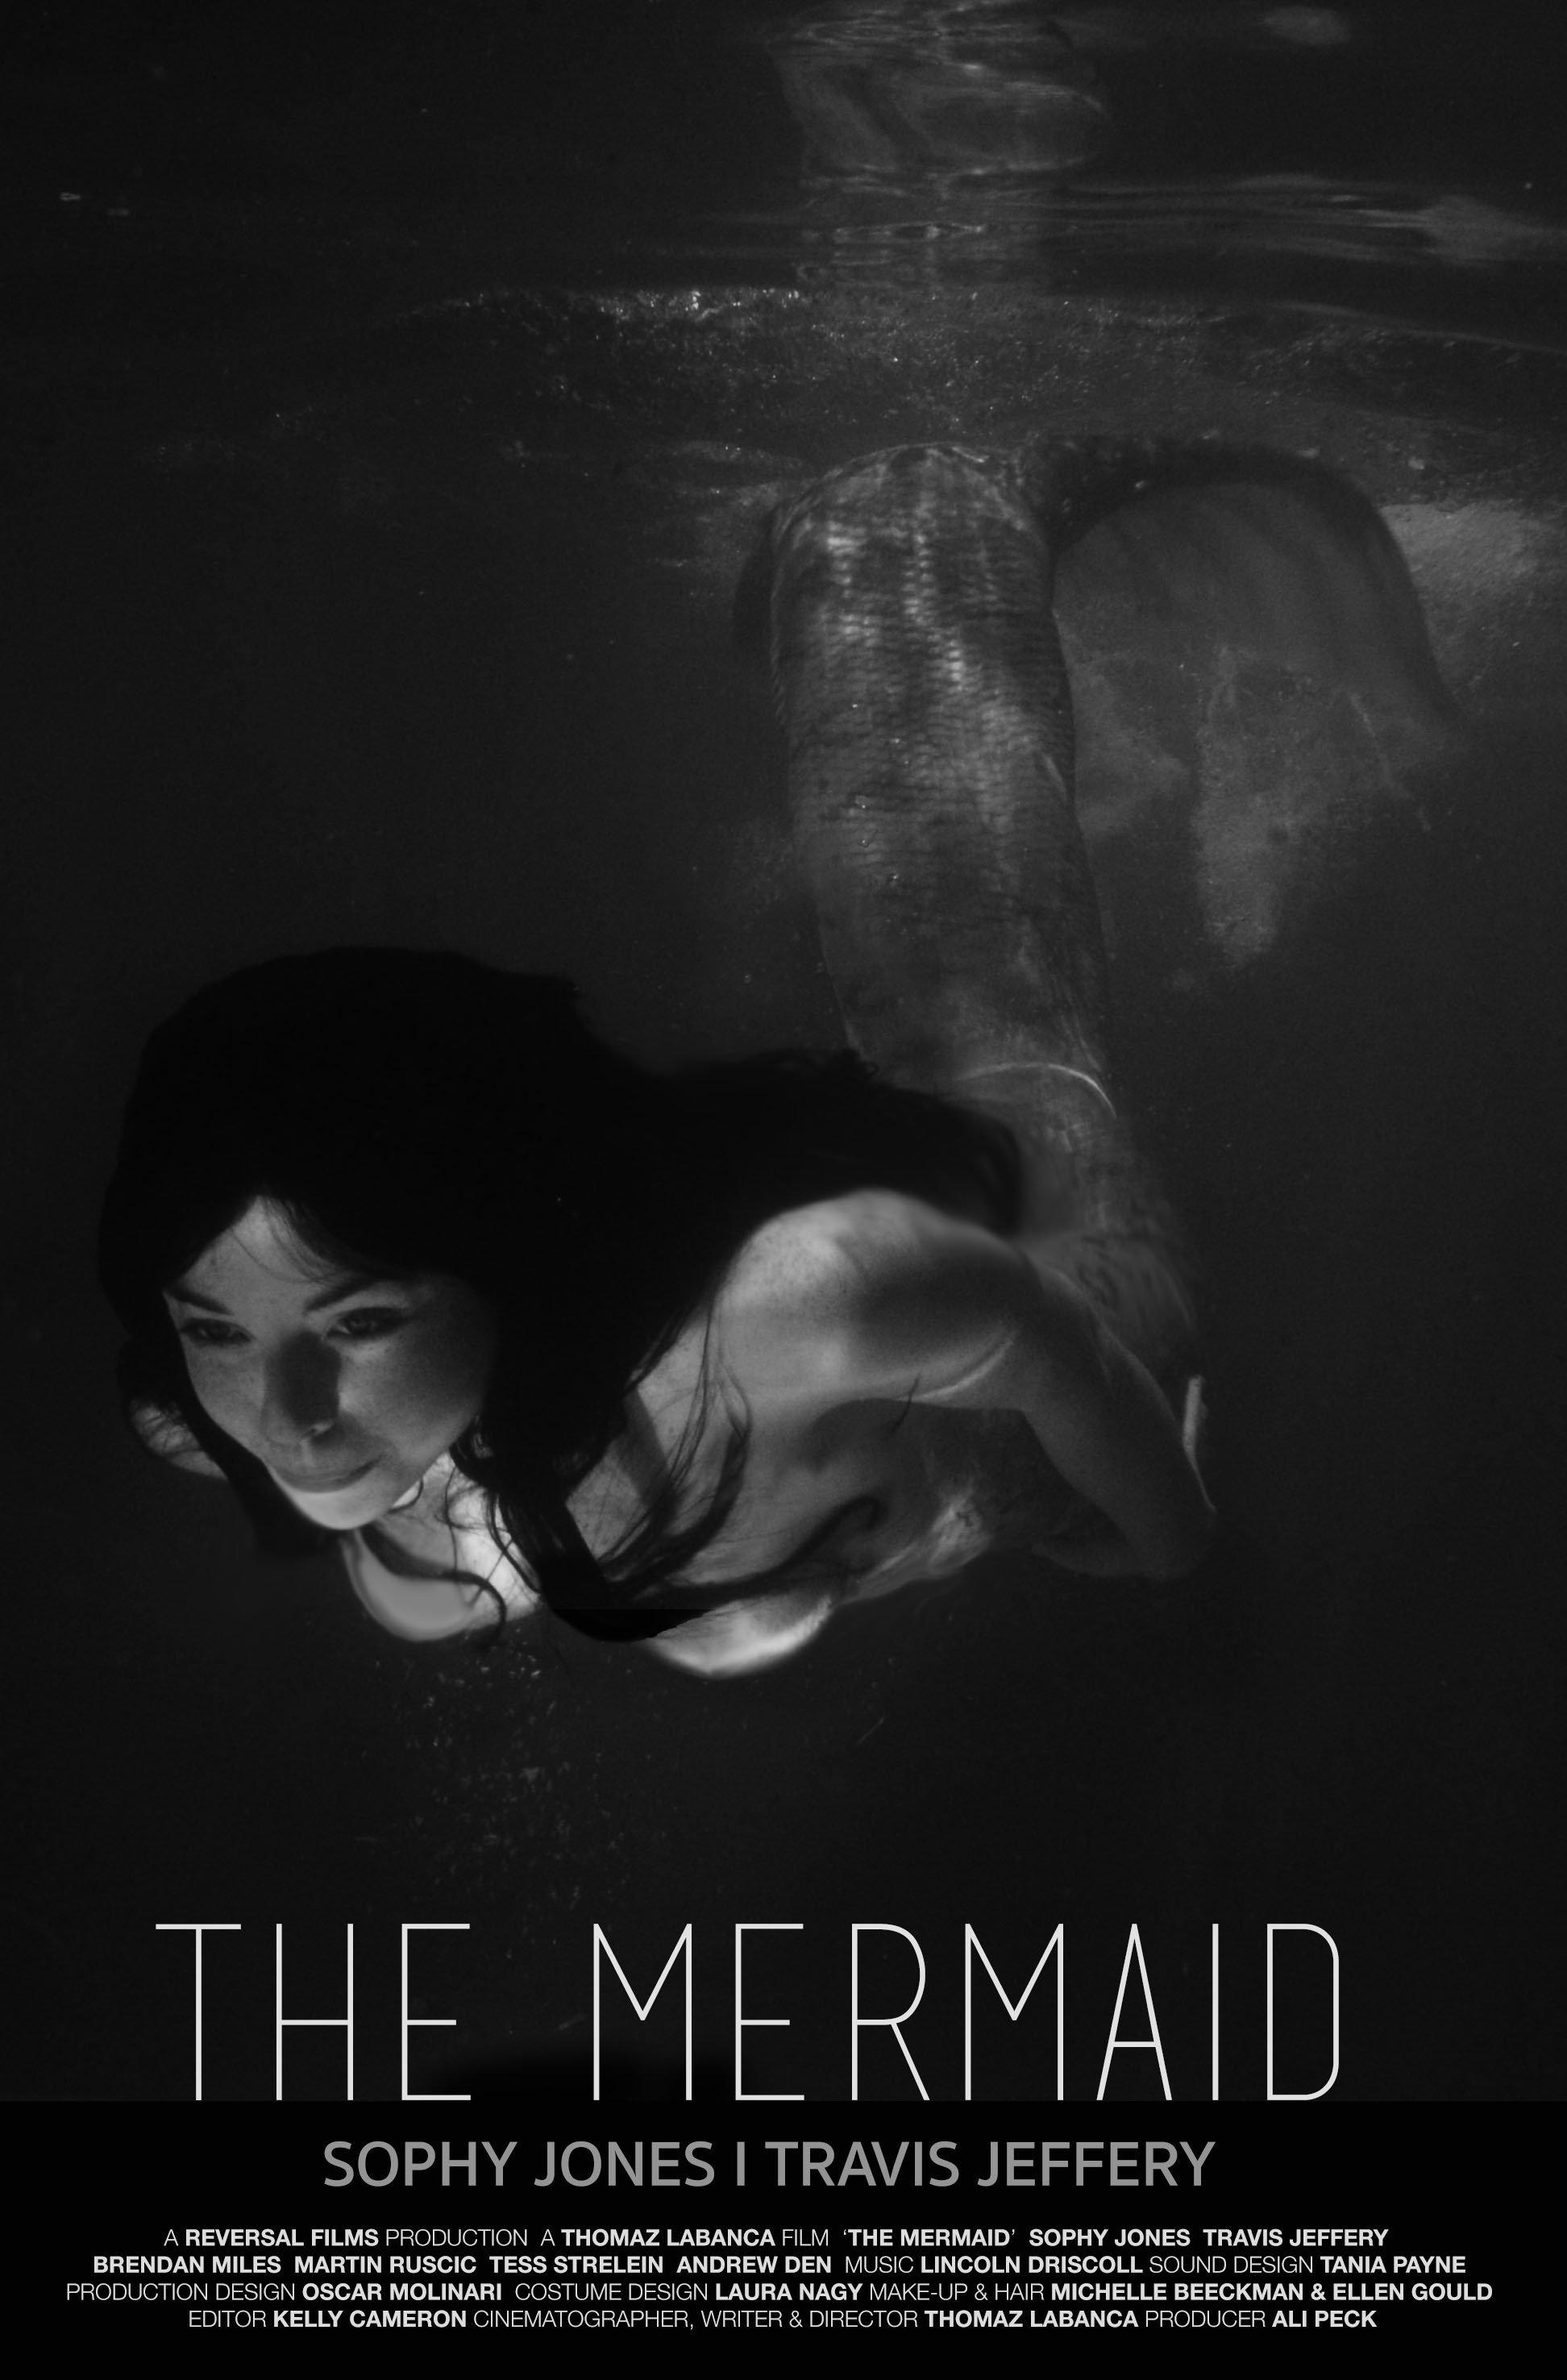 The Mermaid 2016 Imdb